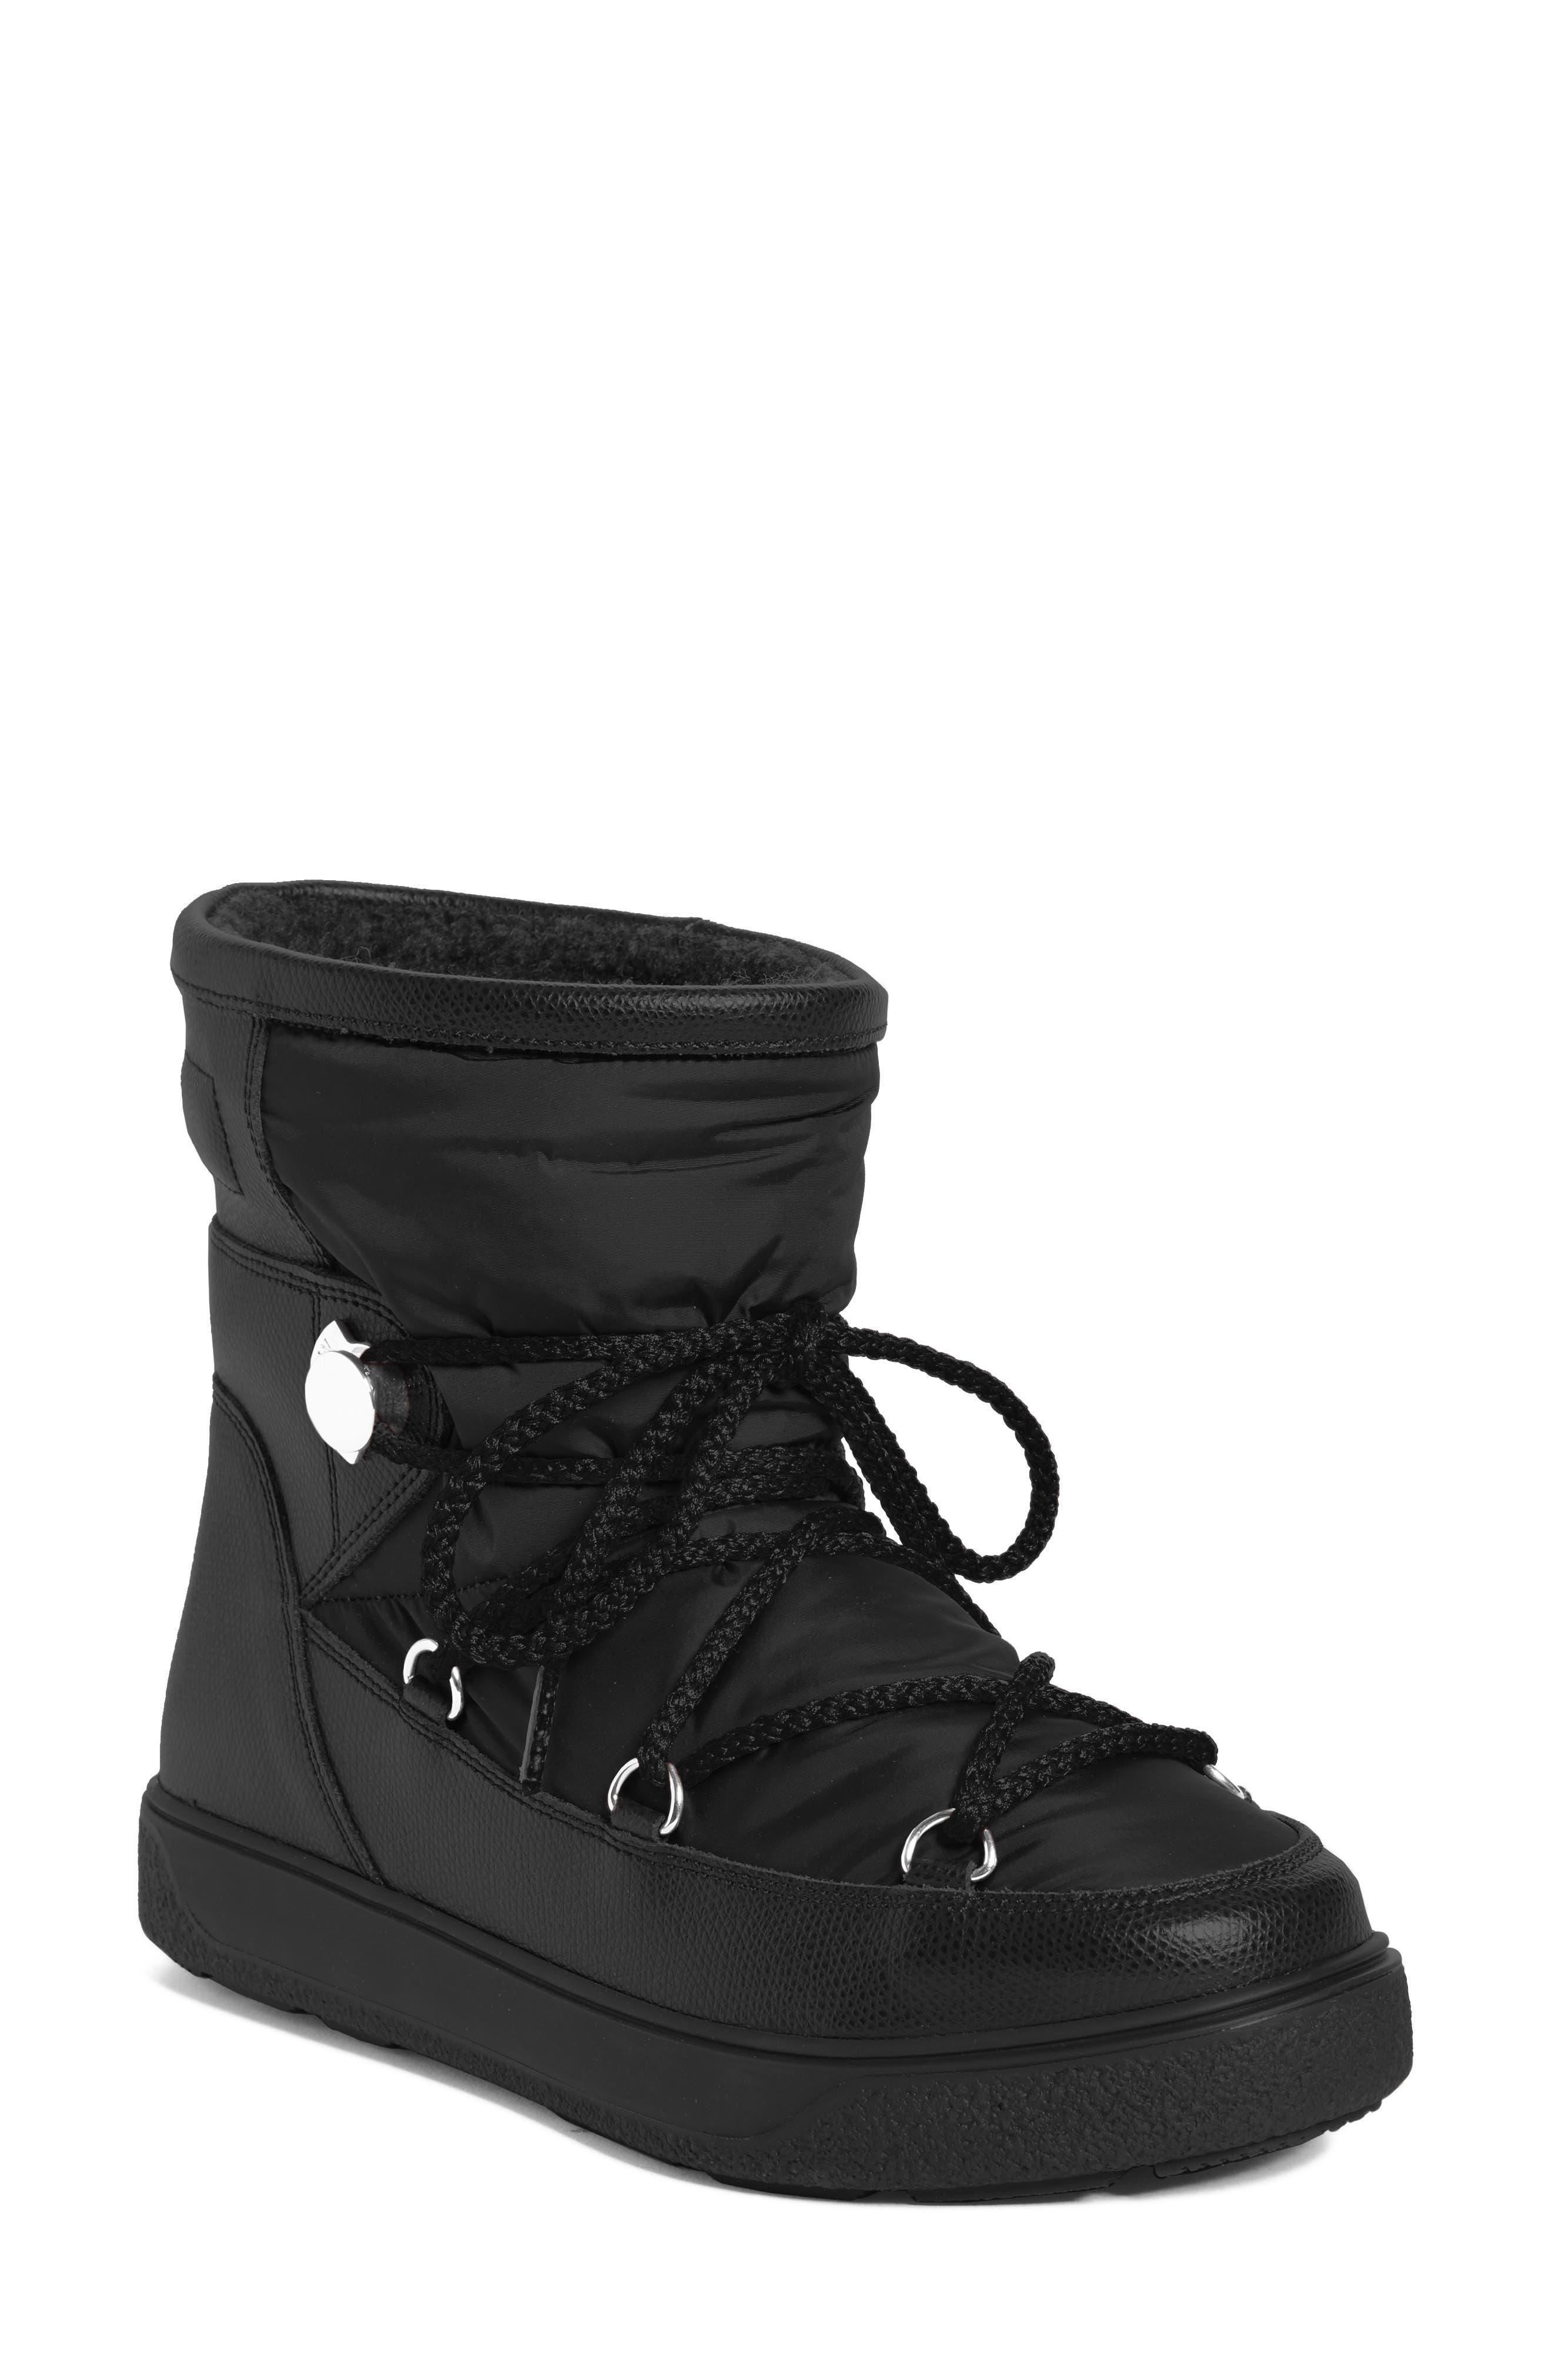 New Fanny Stivale Short Boots,                             Main thumbnail 1, color,                             001